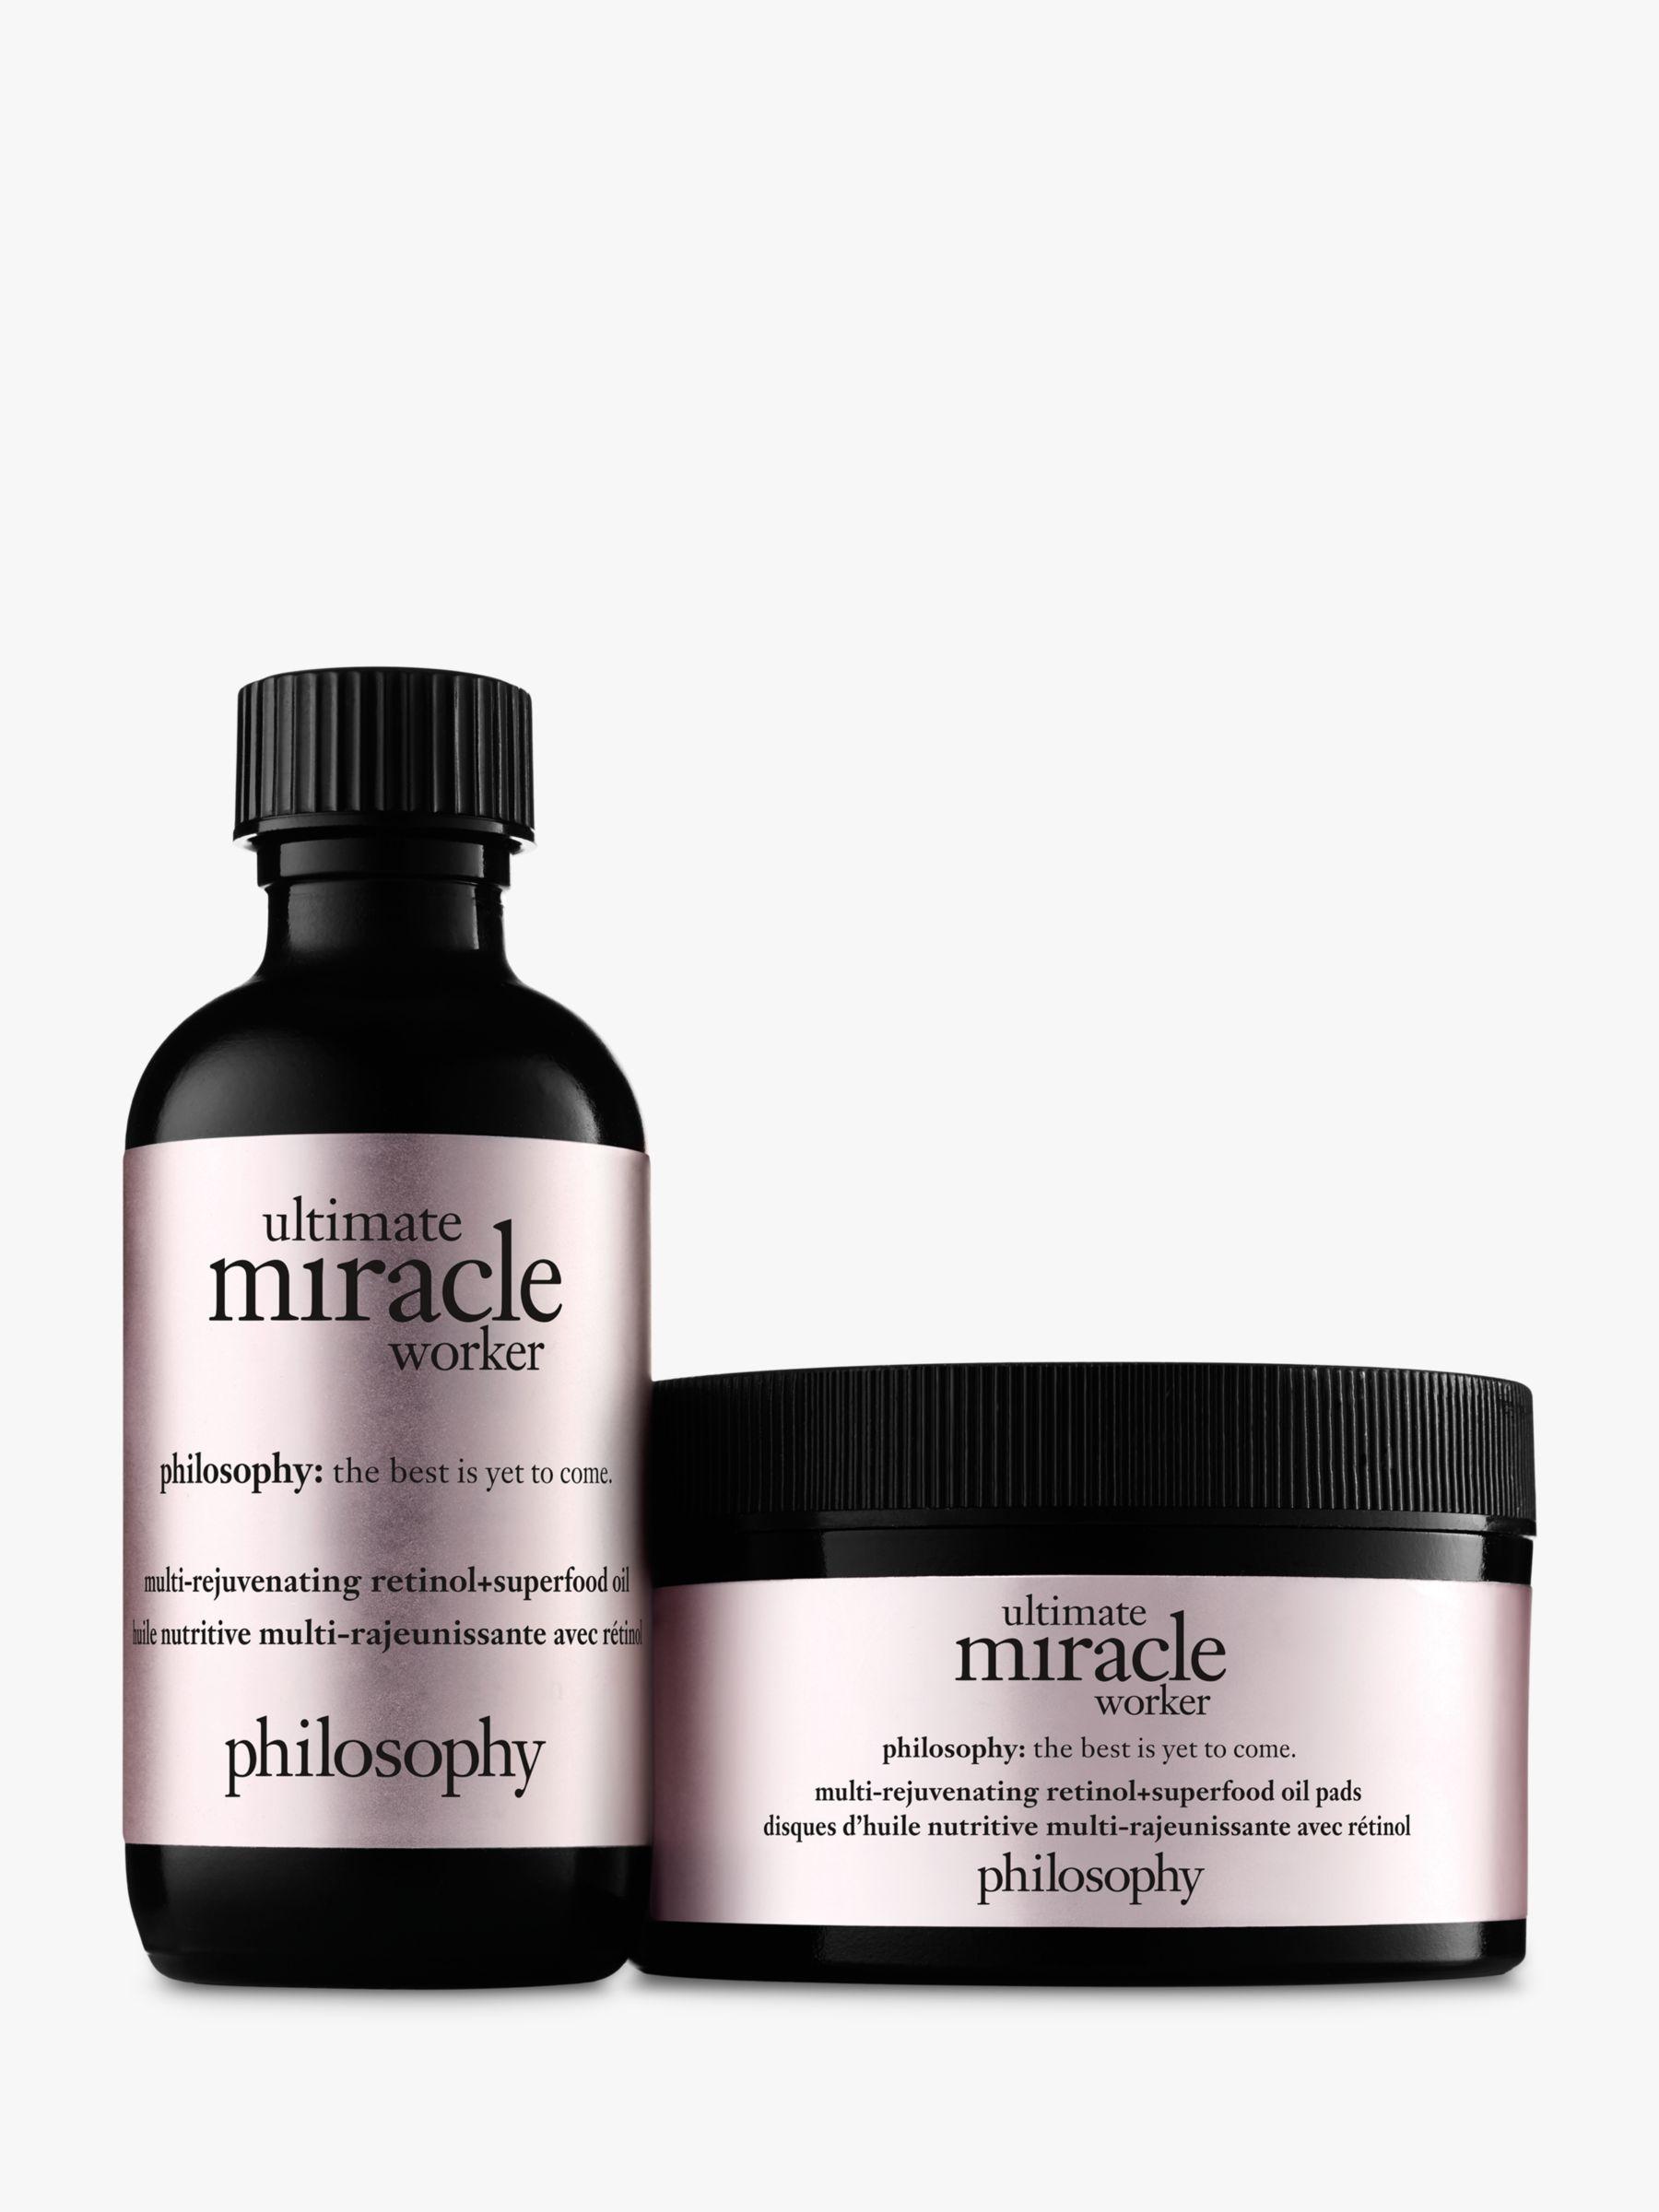 Philosophy Philosophy Ultimate Miracle Worker Multi-Rejuvenating Retinol+Superfood Oil with Pads